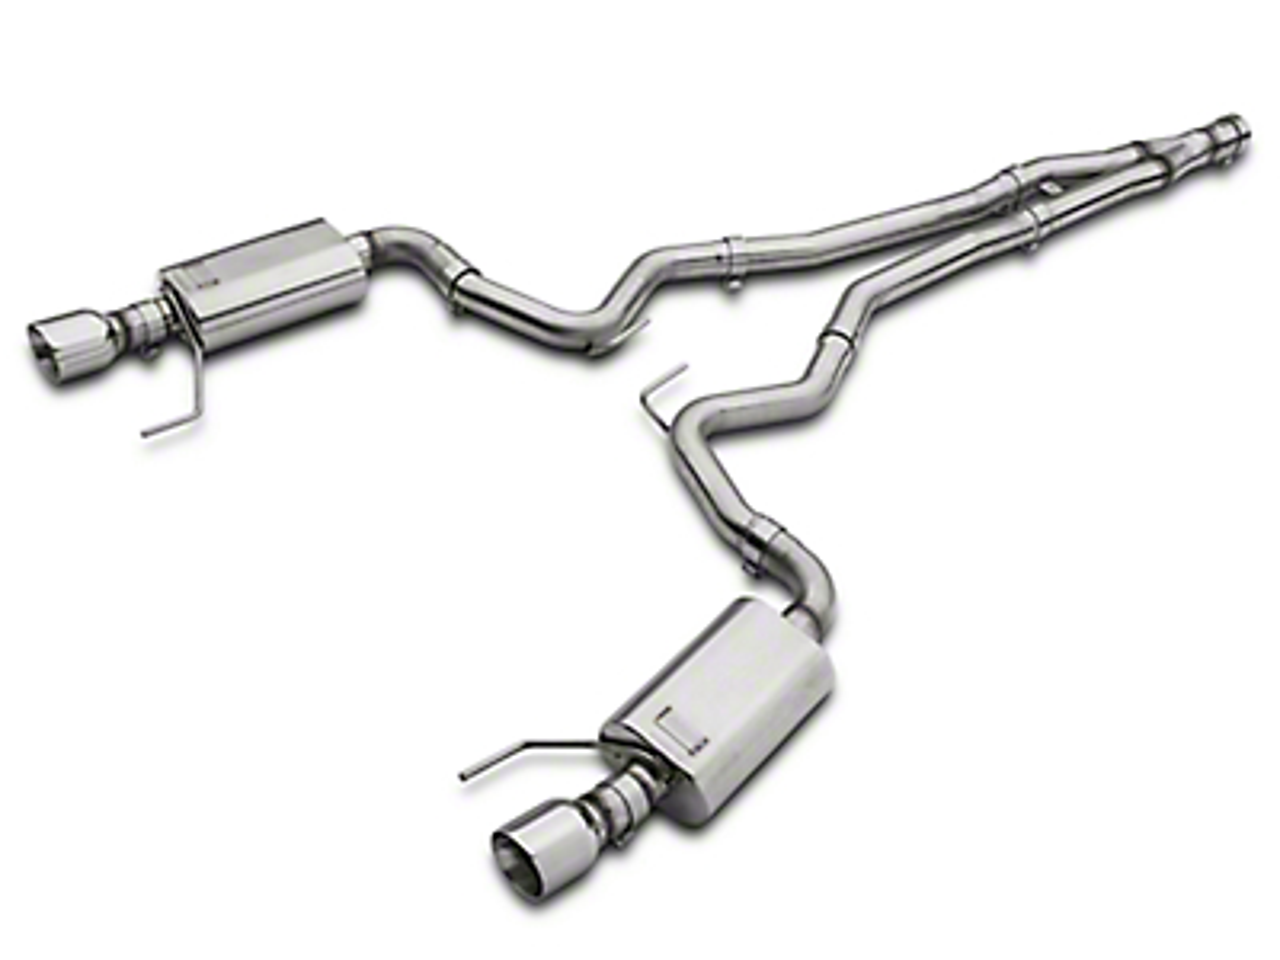 Kooks Cat-Back Exhaust w/ Y-Pipe (15-19 EcoBoost Fastback w/ Kooks Down Pipe)